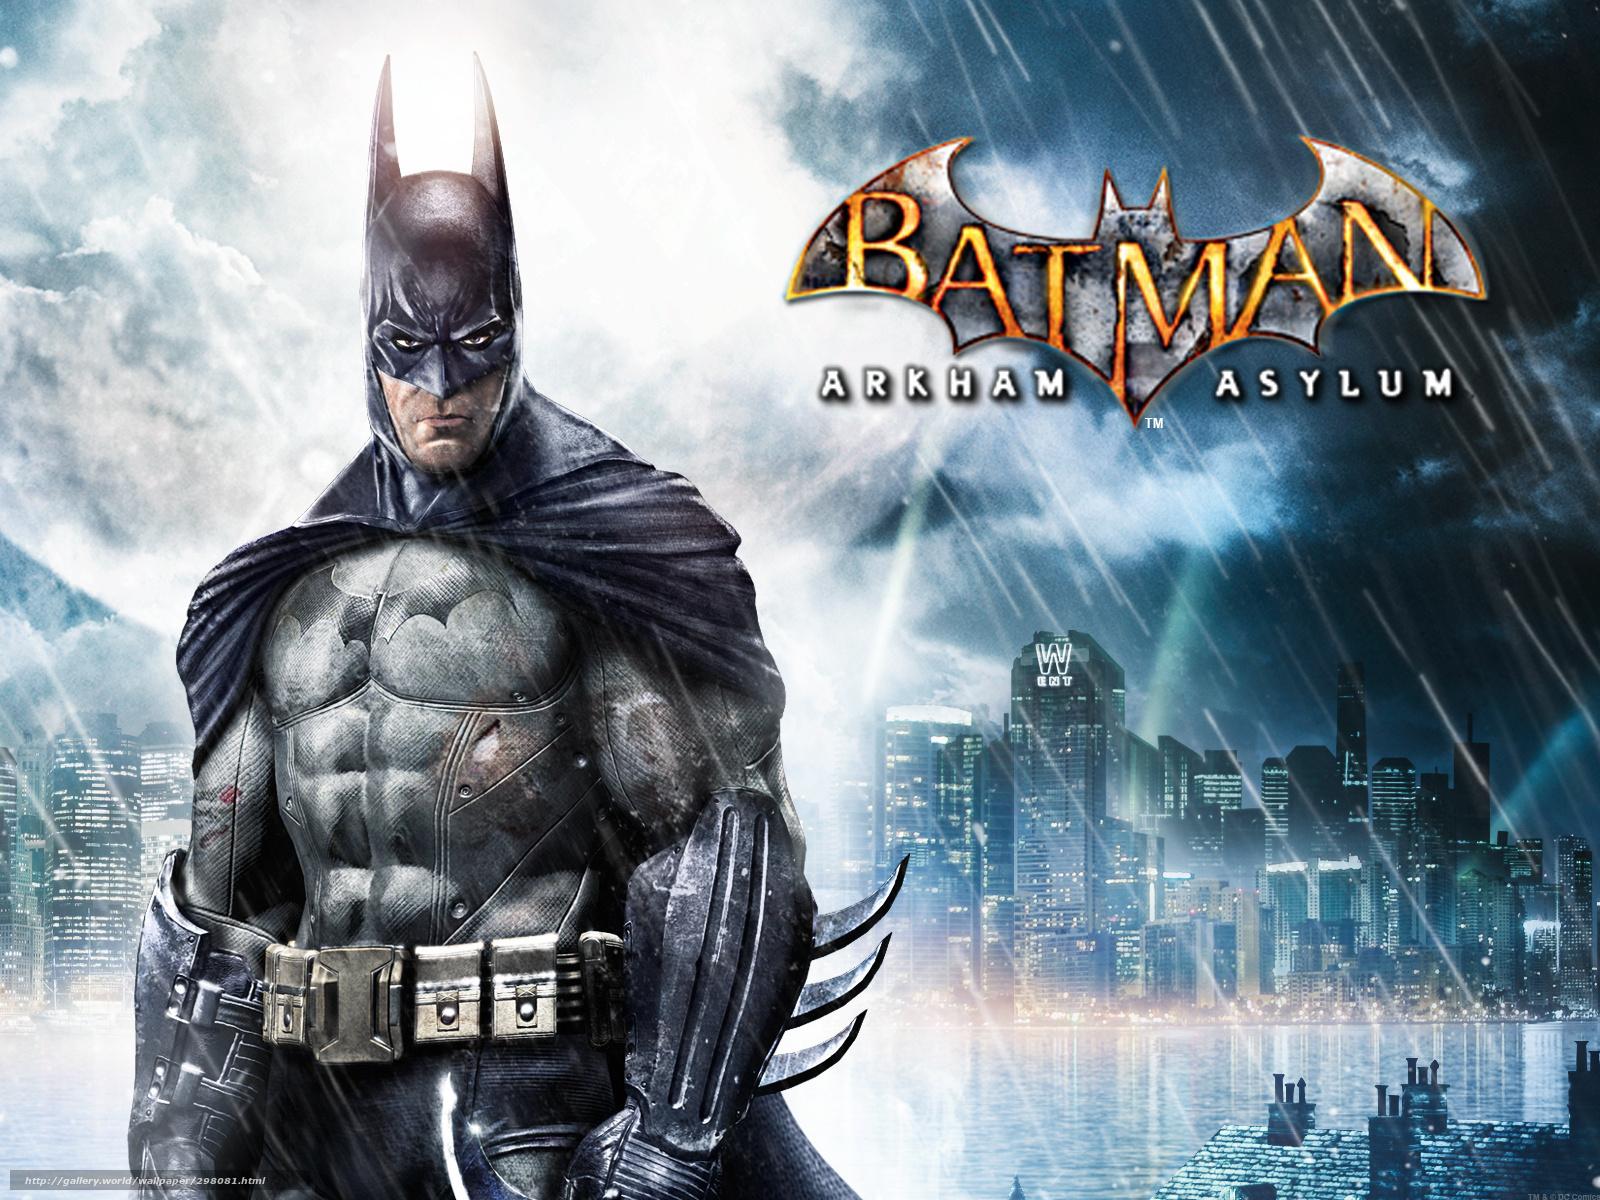 Batman arkham aslum porn clips nude tube